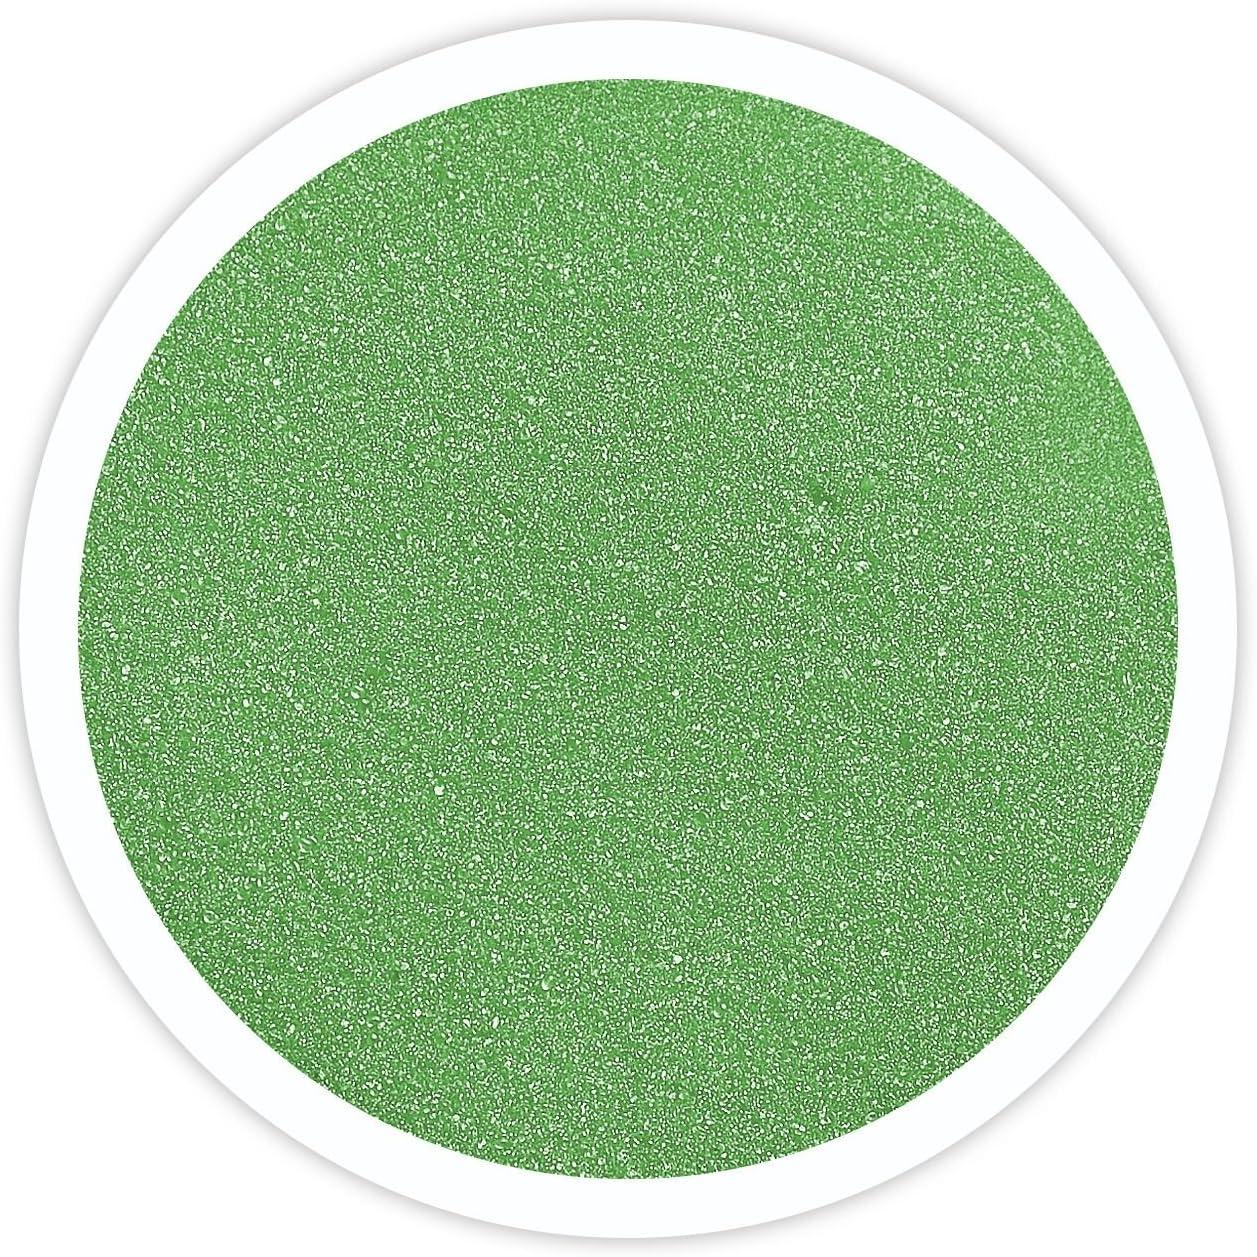 Sandsational Superlatite Clover Green Unity Sand 1 Colored for Pound service